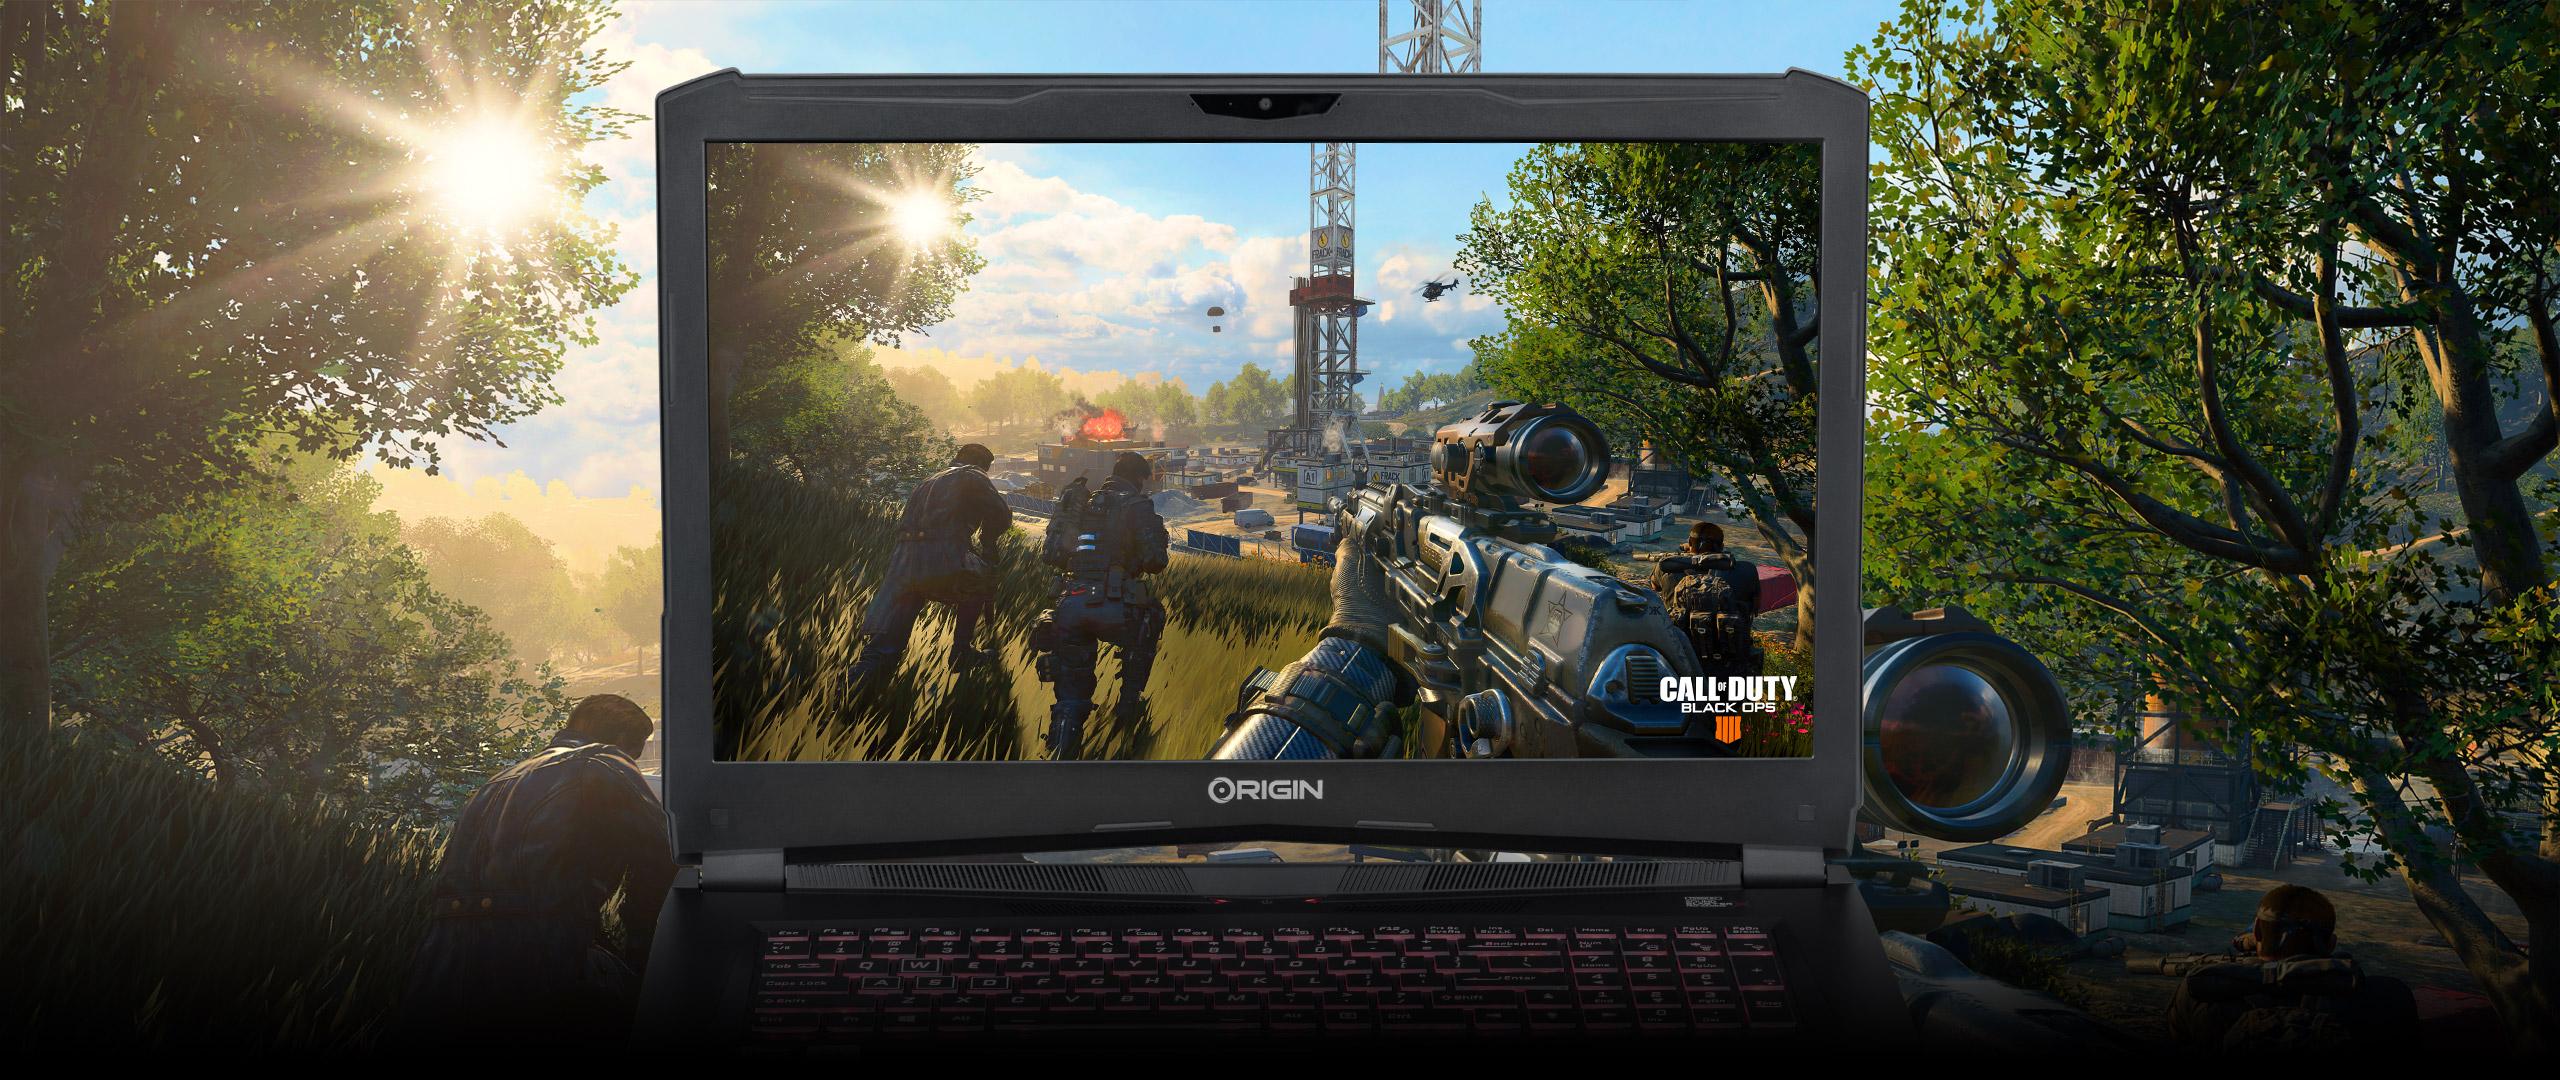 EVO17-S custom gaming laptop running Call of Duty: Black Ops 4